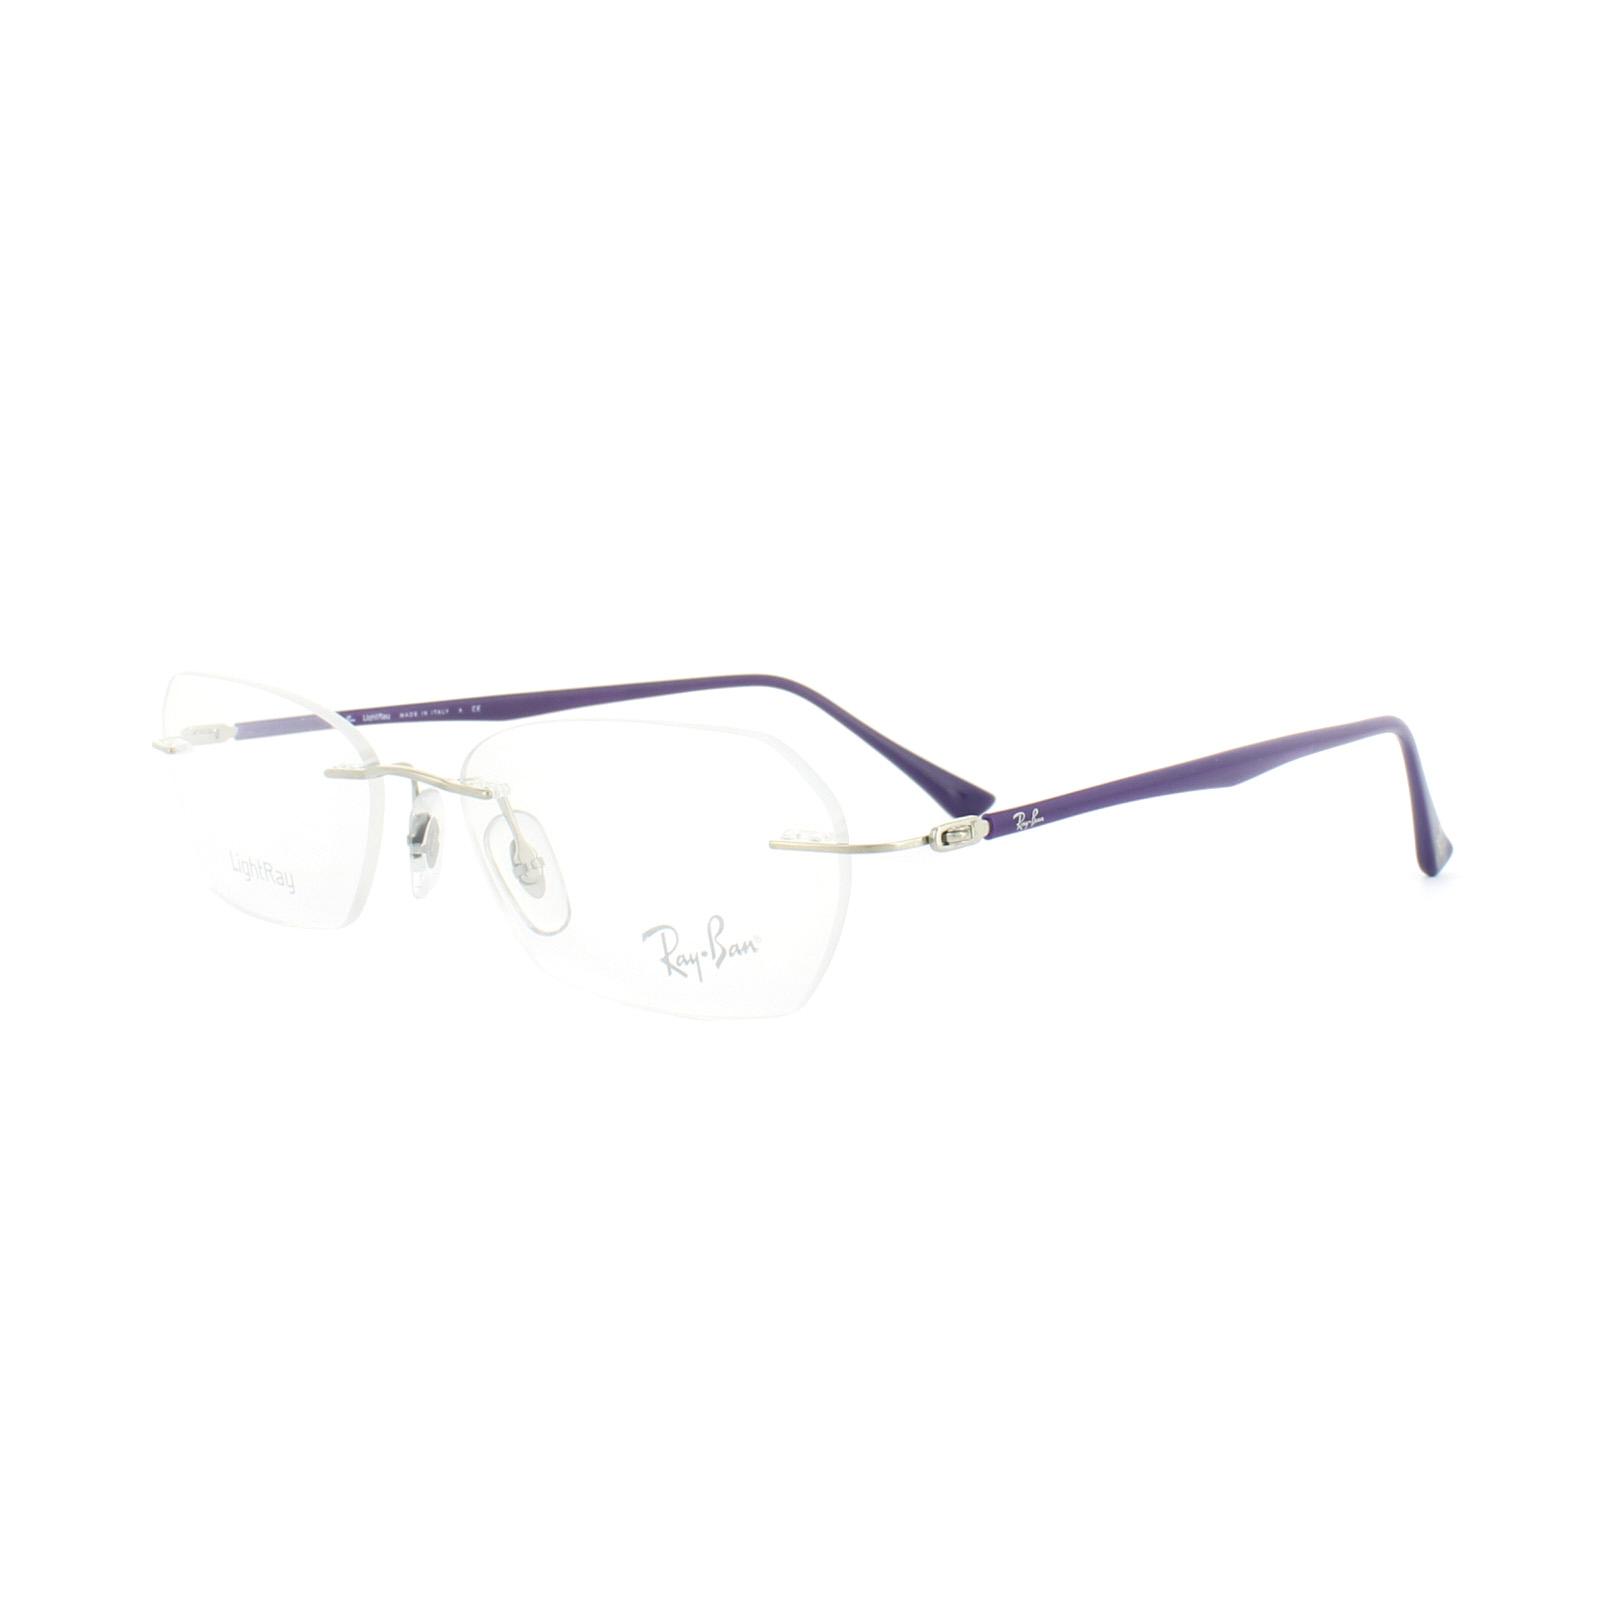 bc865af084 Sentinel Ray-Ban Glasses Frames RX 8703 1002 Silver Purple Mens 50mm